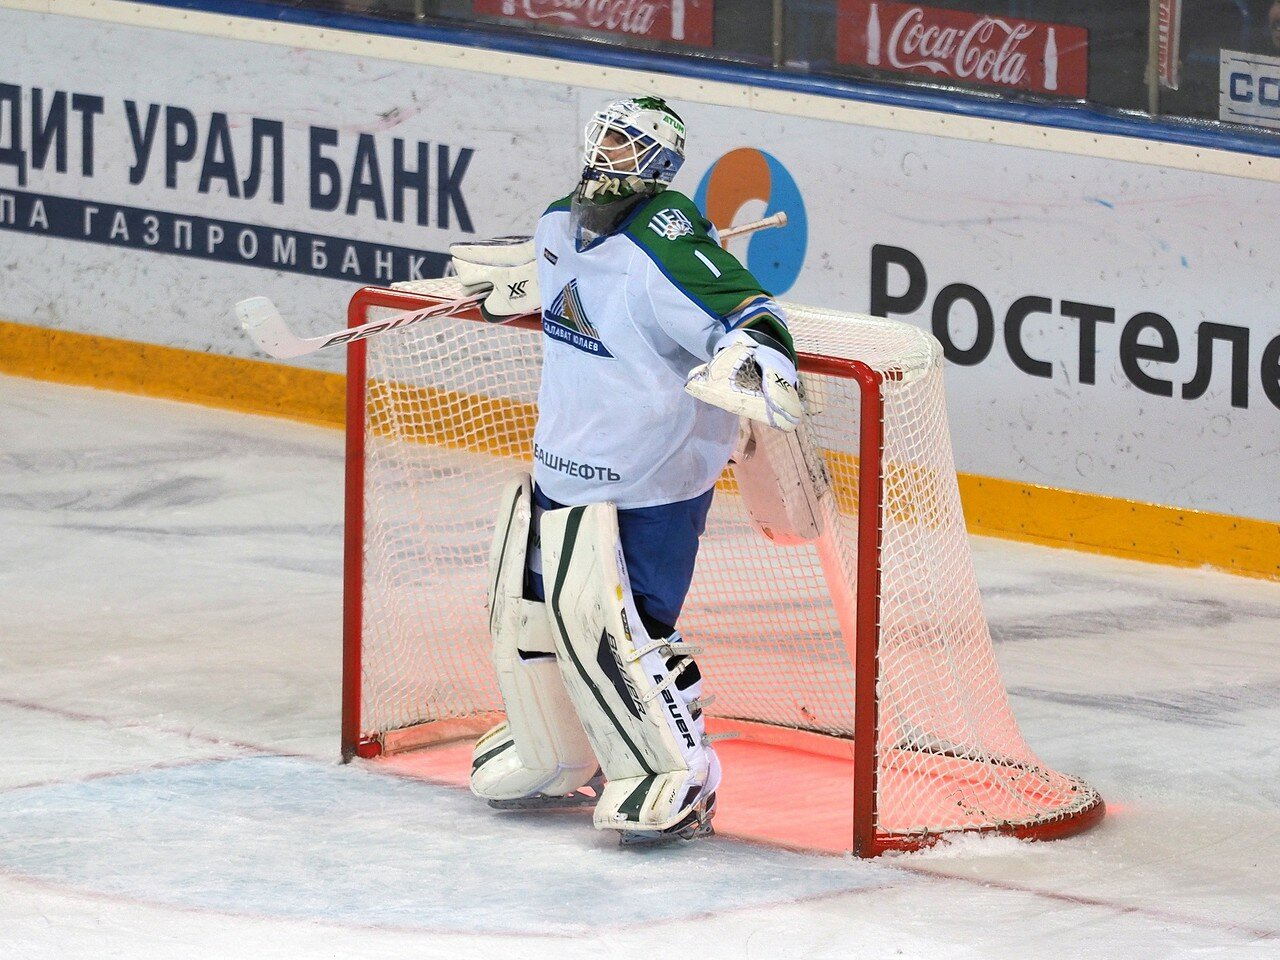 109Плей-офф 2016 Восток Финал Металлург - Салават Юлаев 23.03.2016